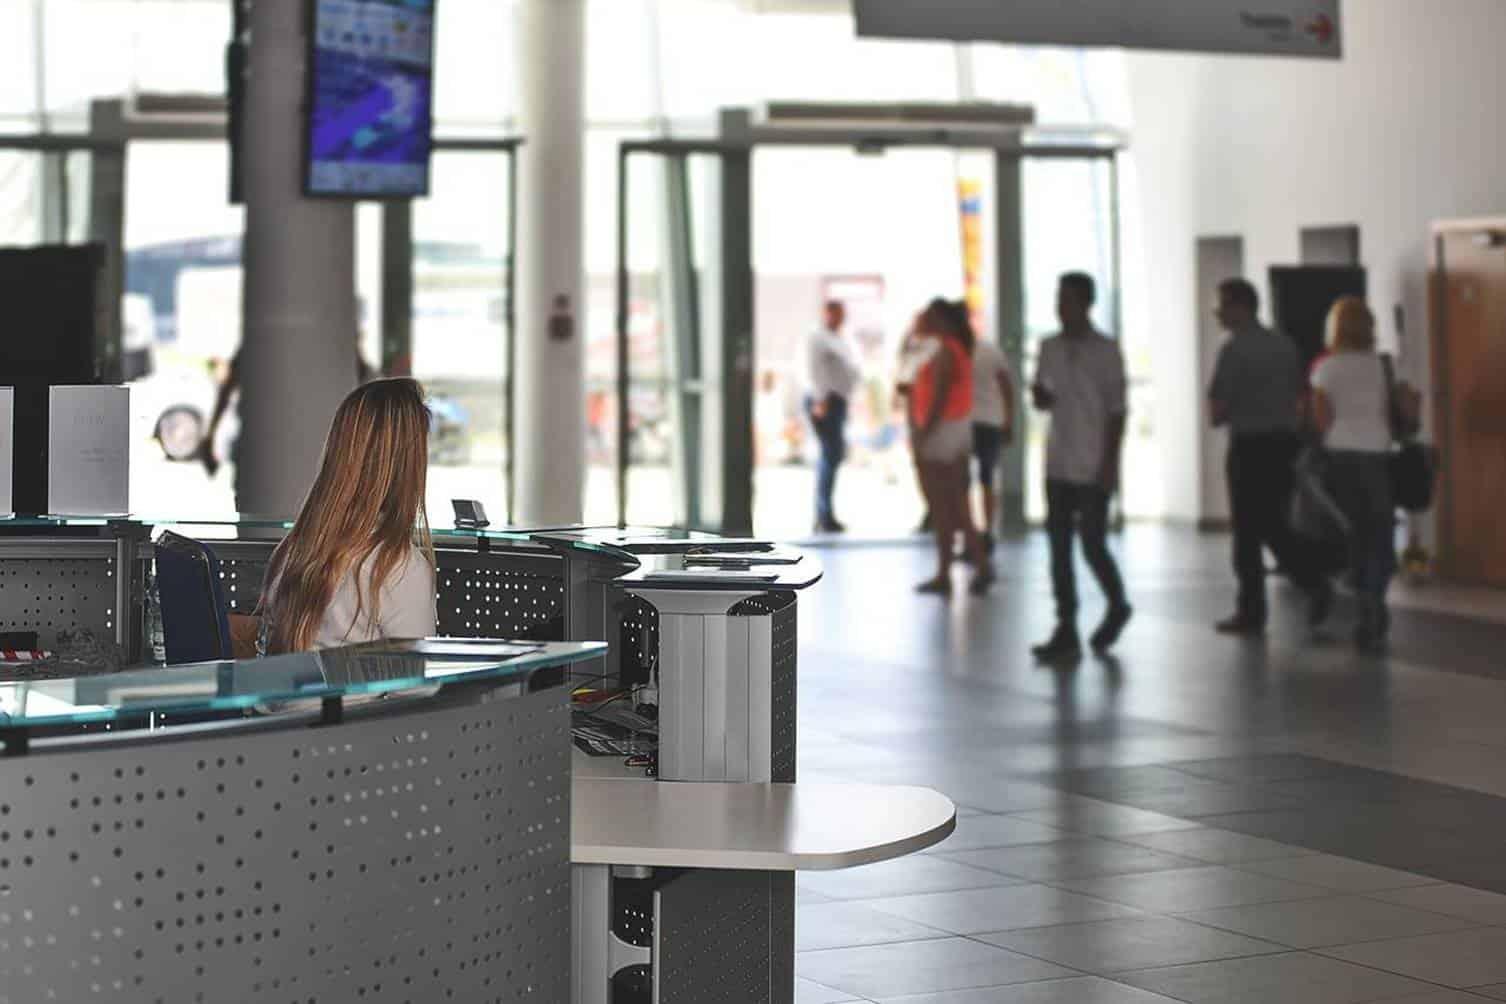 Como enviar currículo para trabalhar nos aeroportos do país